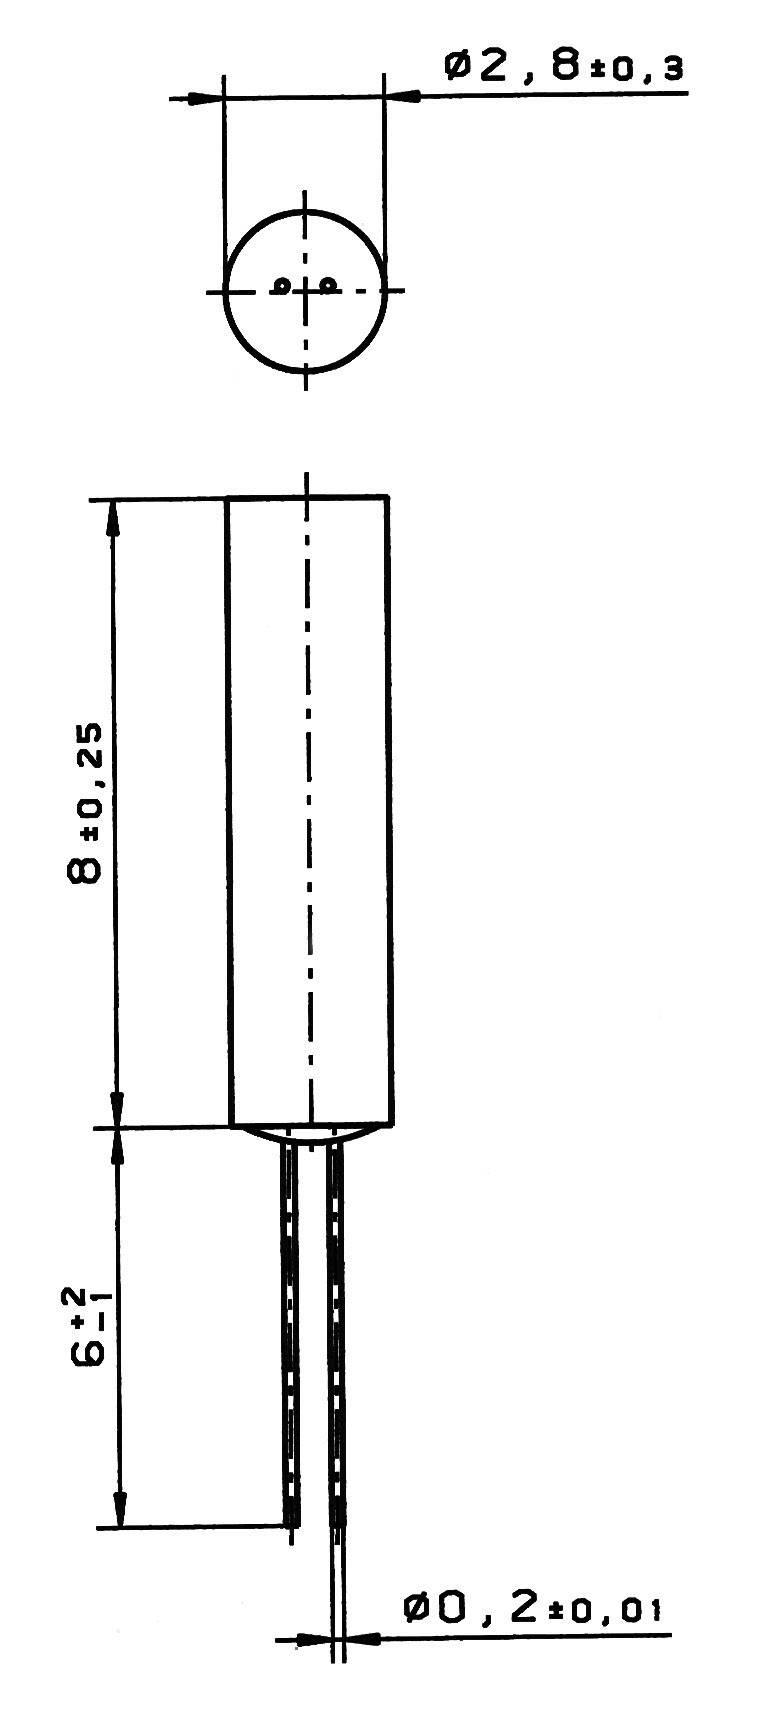 Teplotný senzor v keramickom puzdre